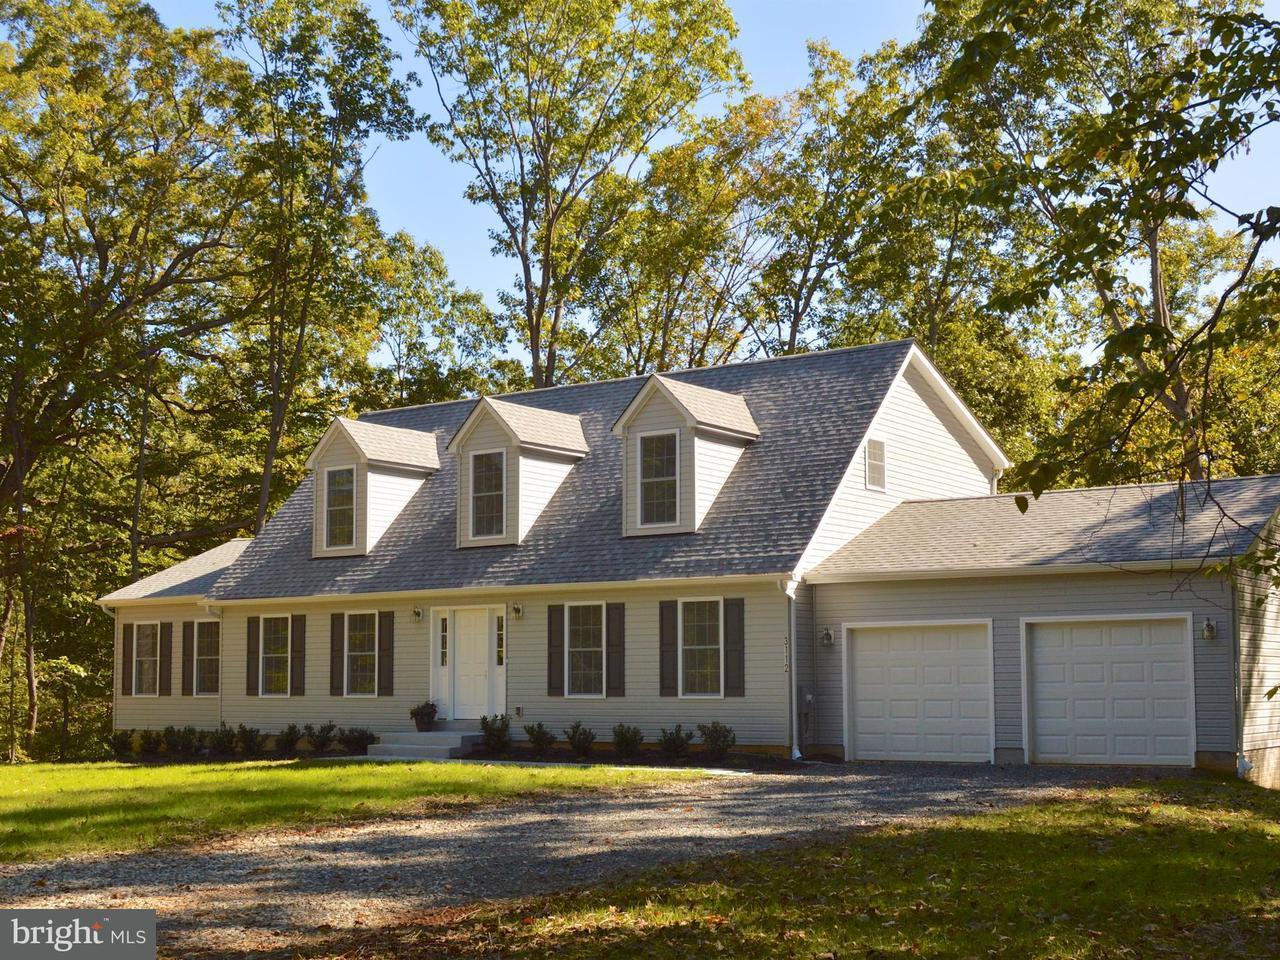 独户住宅 为 销售 在 3112 Powder Mill Road 3112 Powder Mill Road Hyattsville, 马里兰州 20783 美国